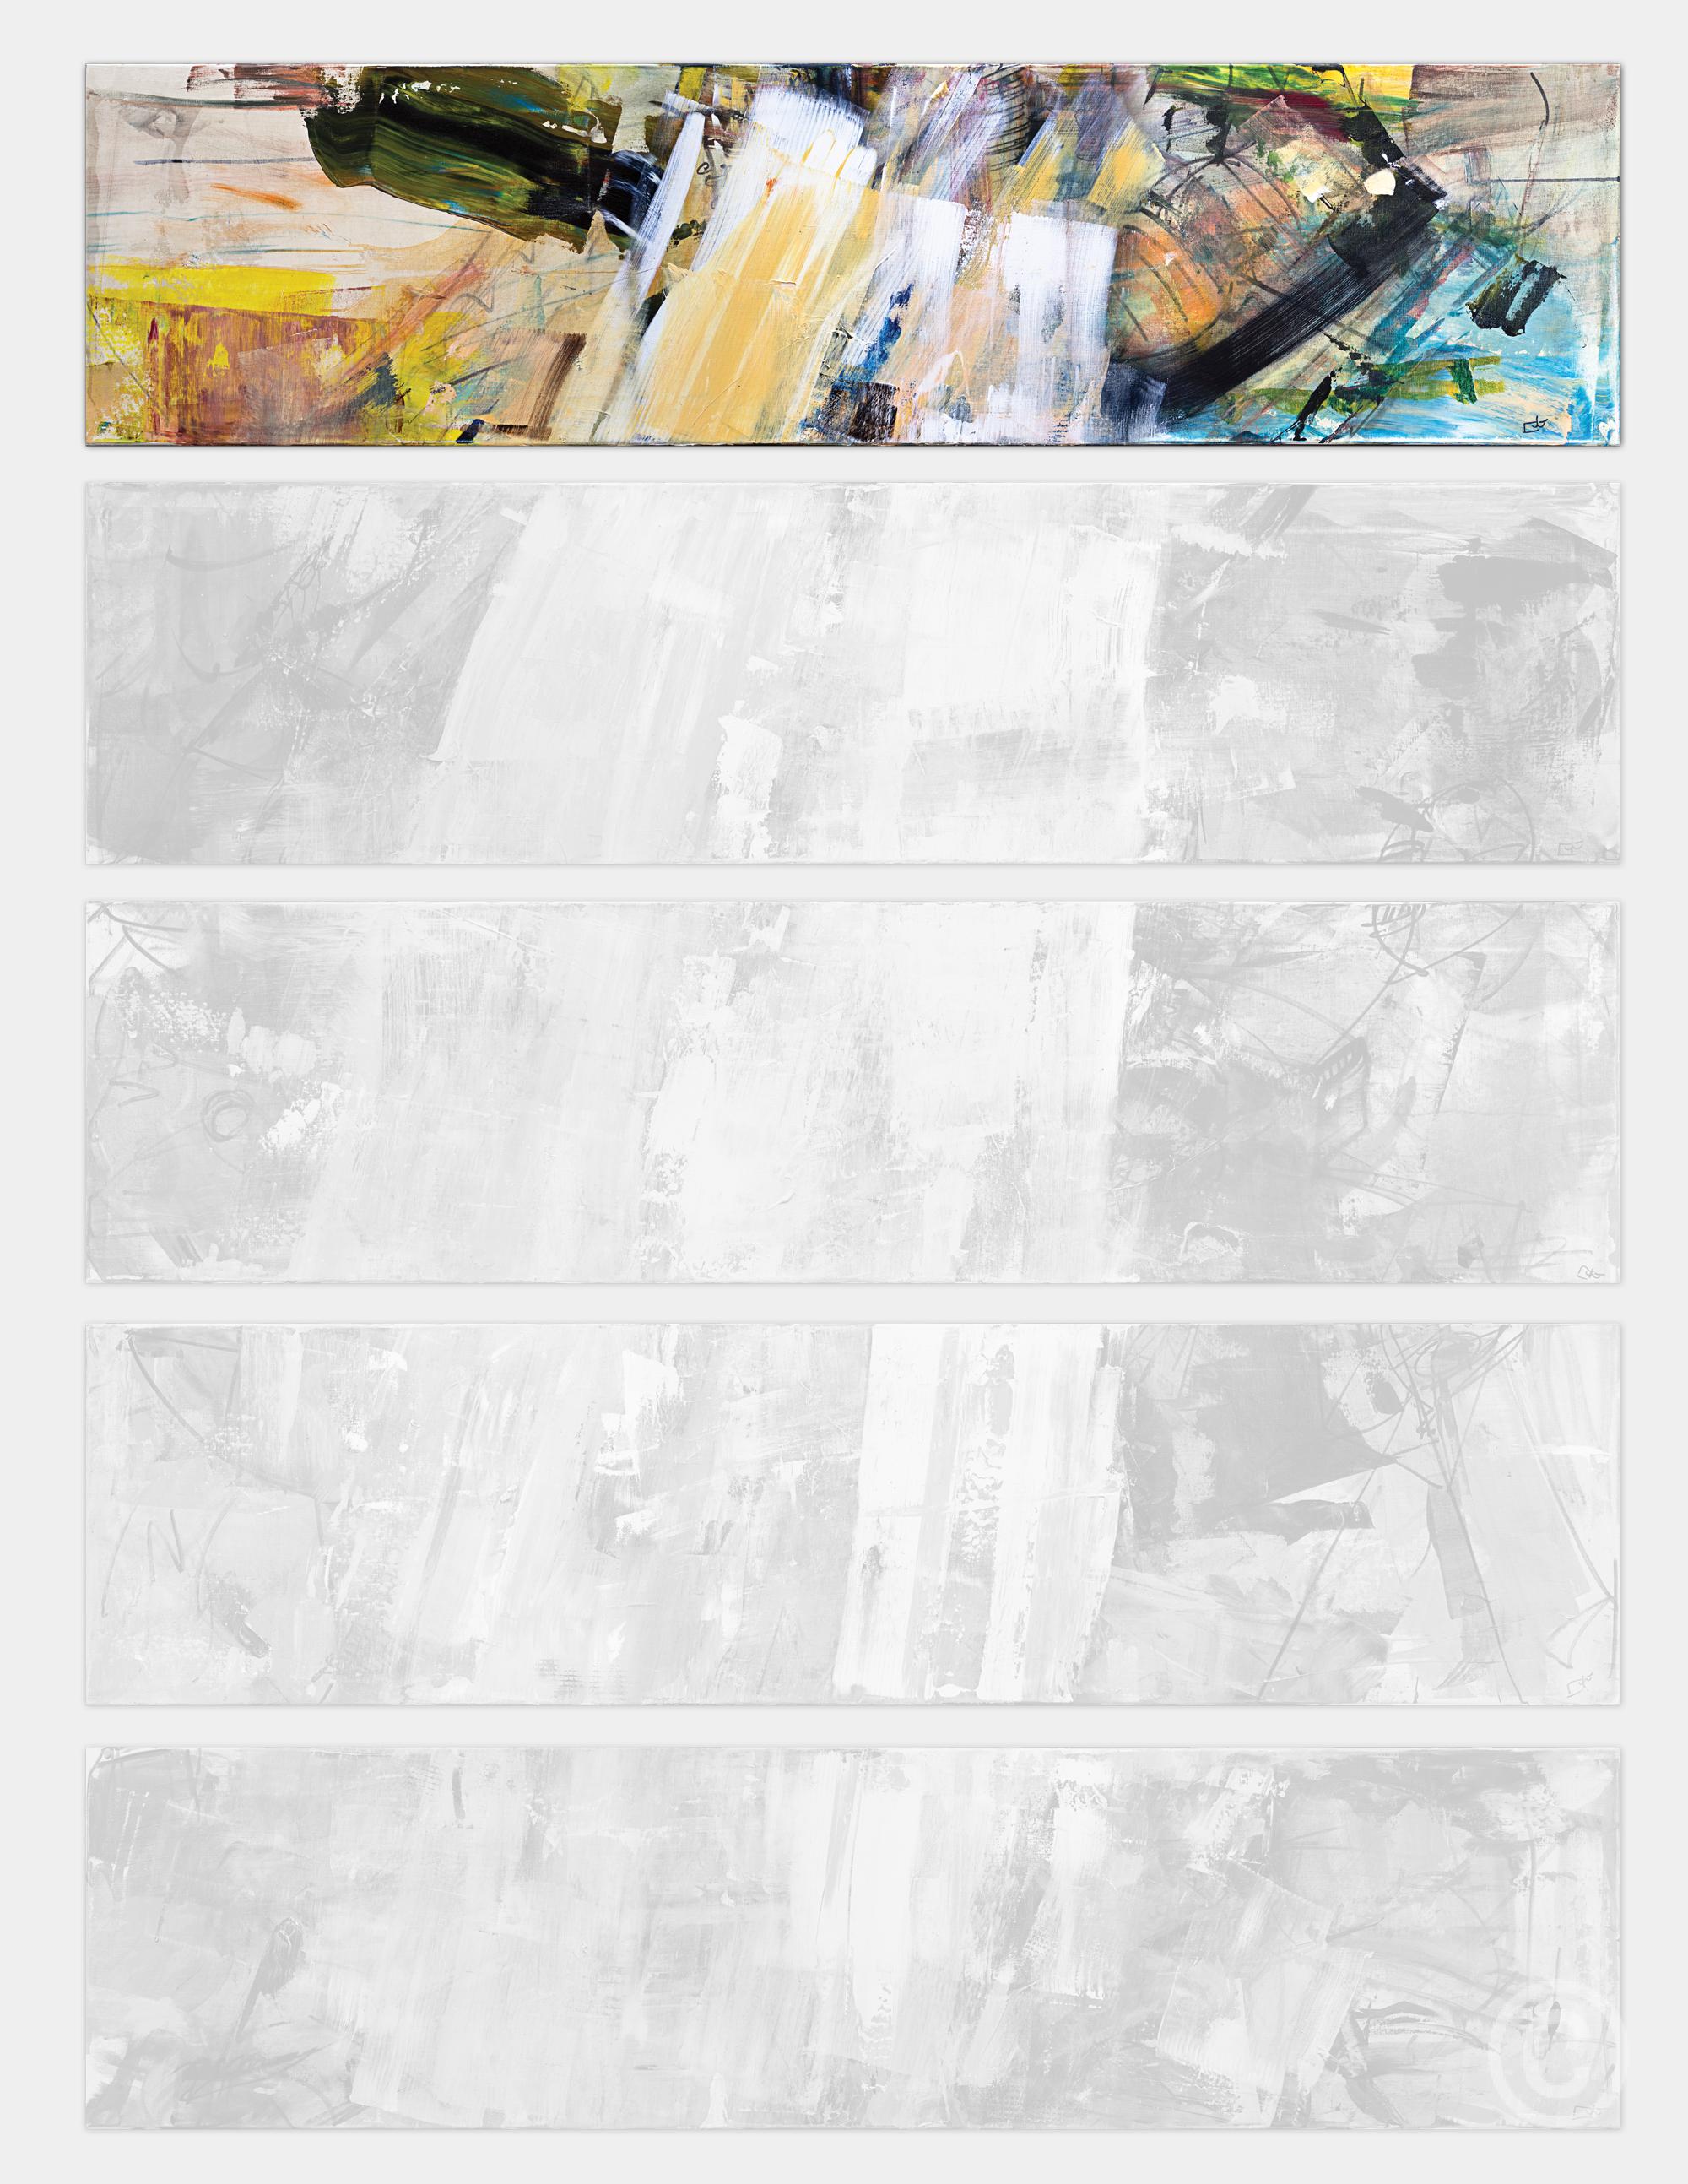 Blancs 12345 - slides 2/5 [200 x 250cm] - vertical (spaced) © Prosper Jerominus, 2013